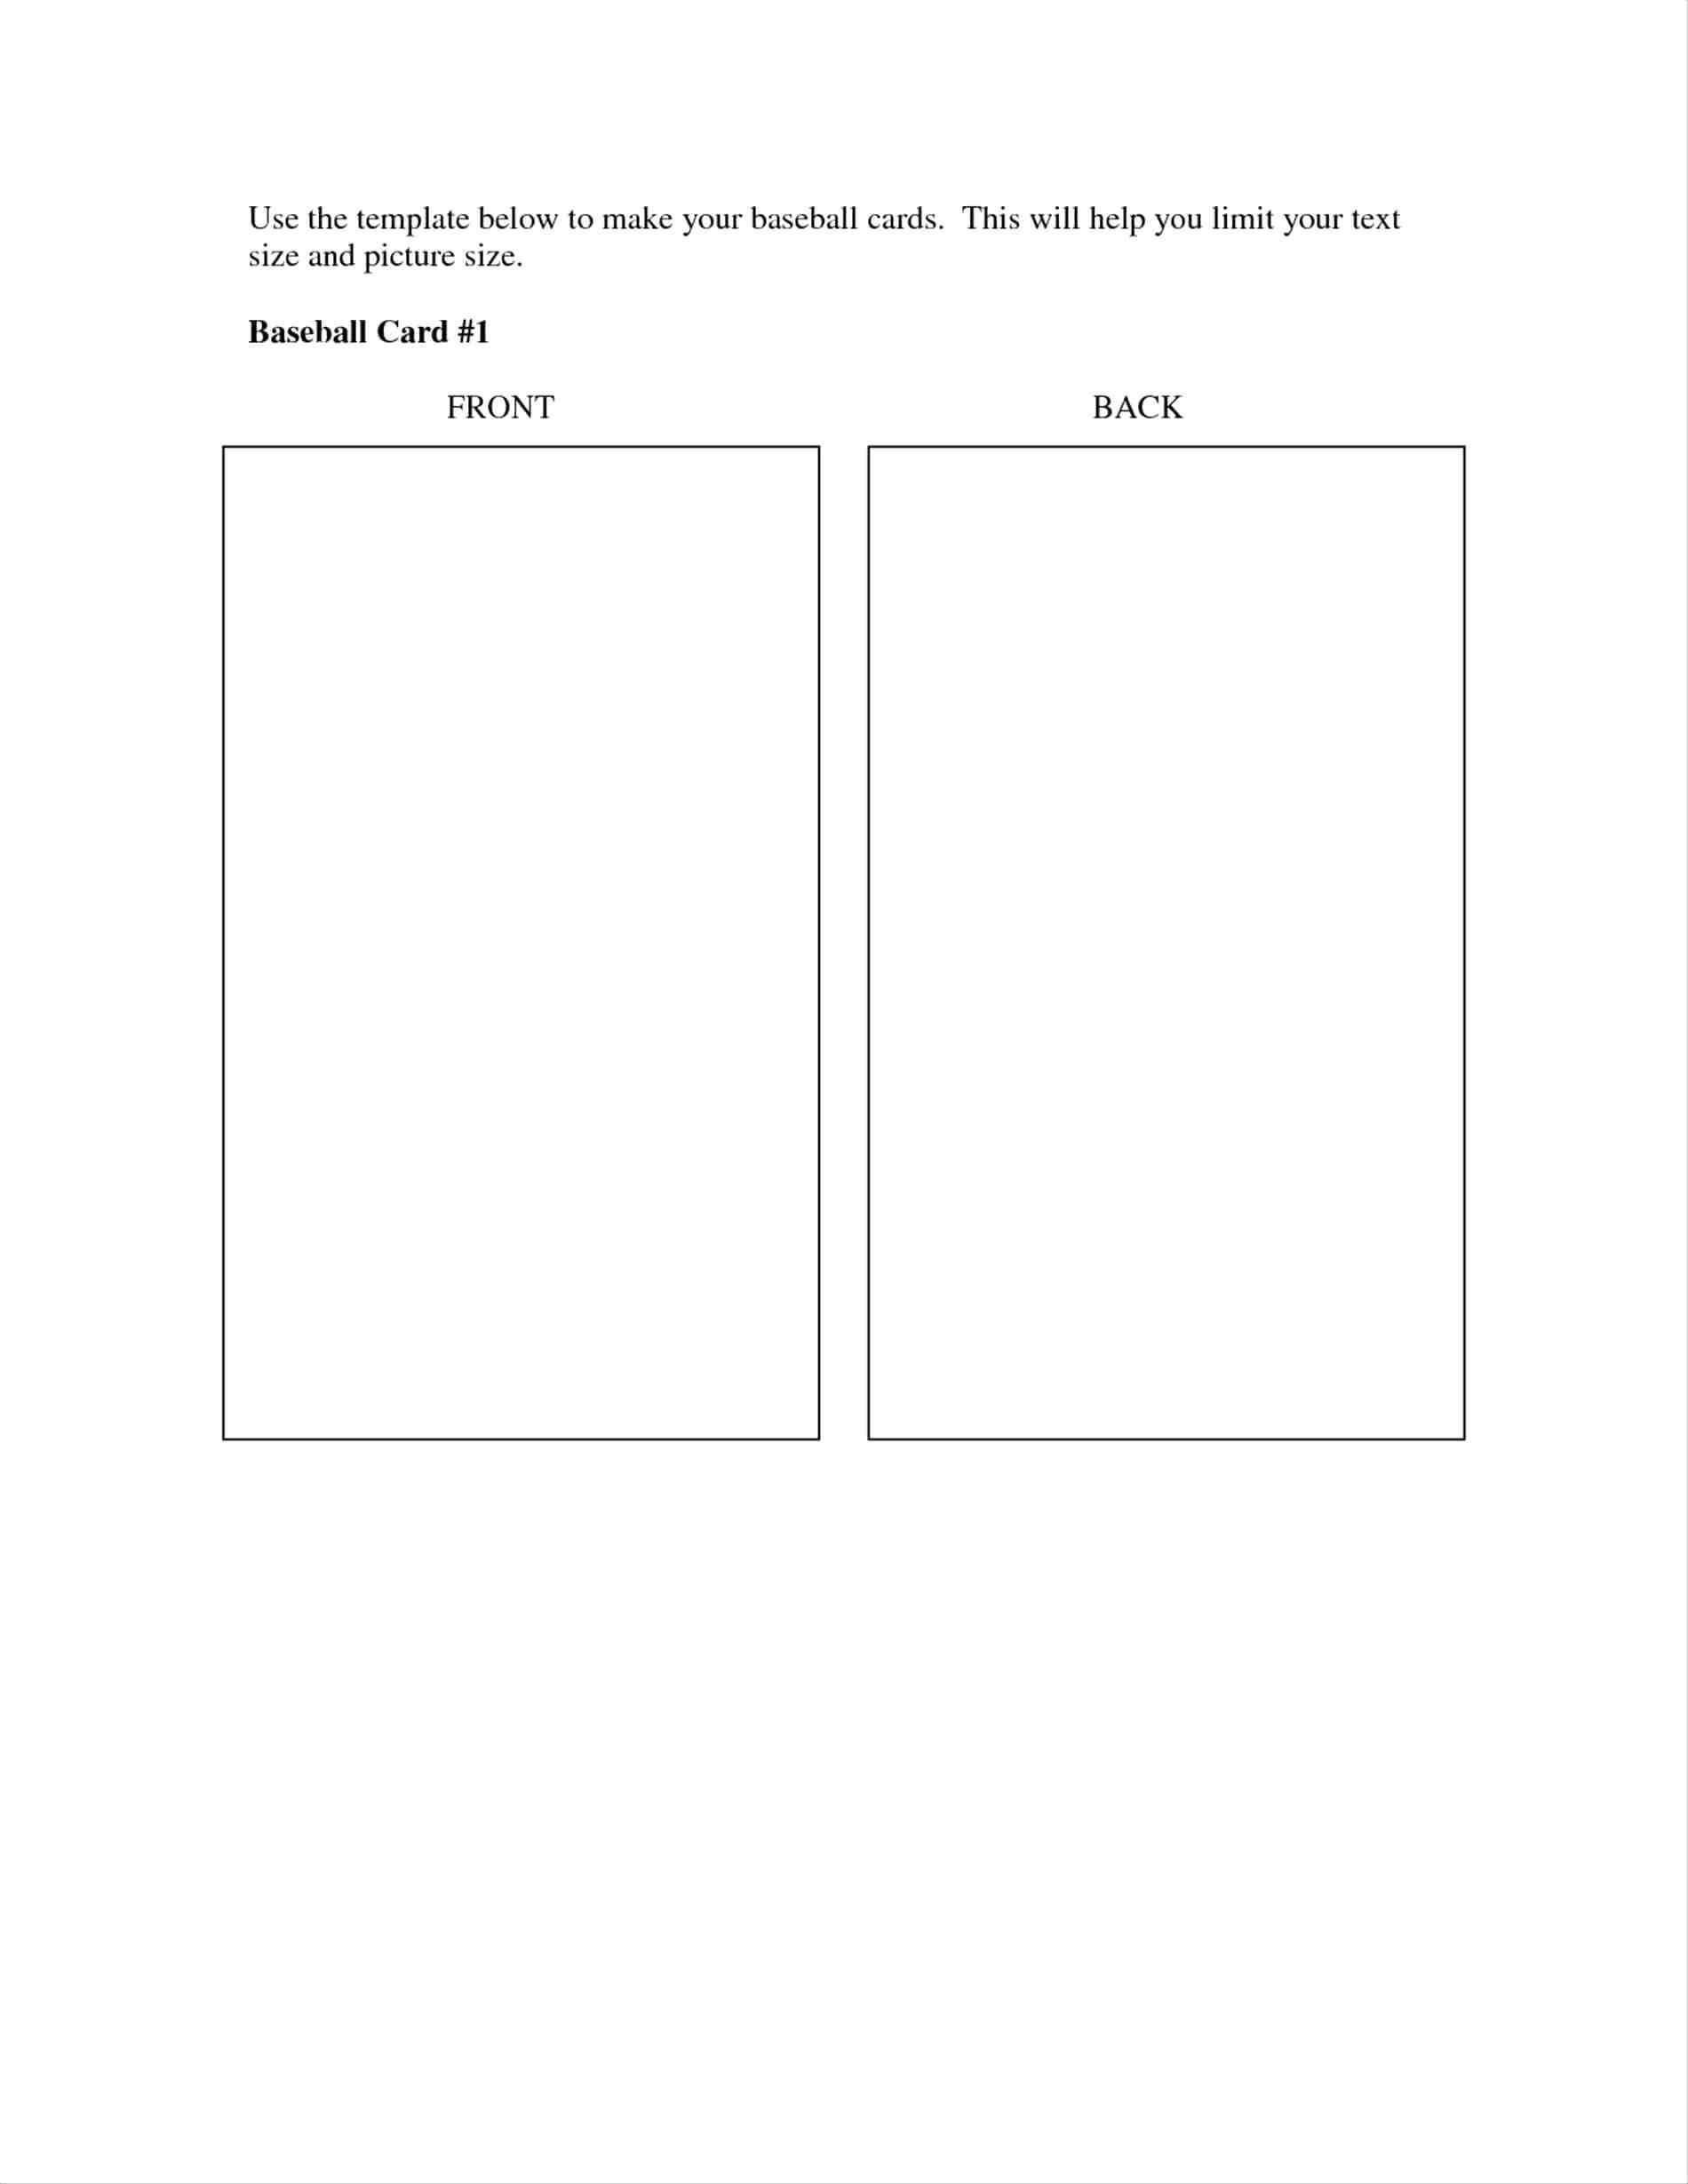 Baseball Card Back Template - Yupar.magdalene-Project with regard to Baseball Card Size Template